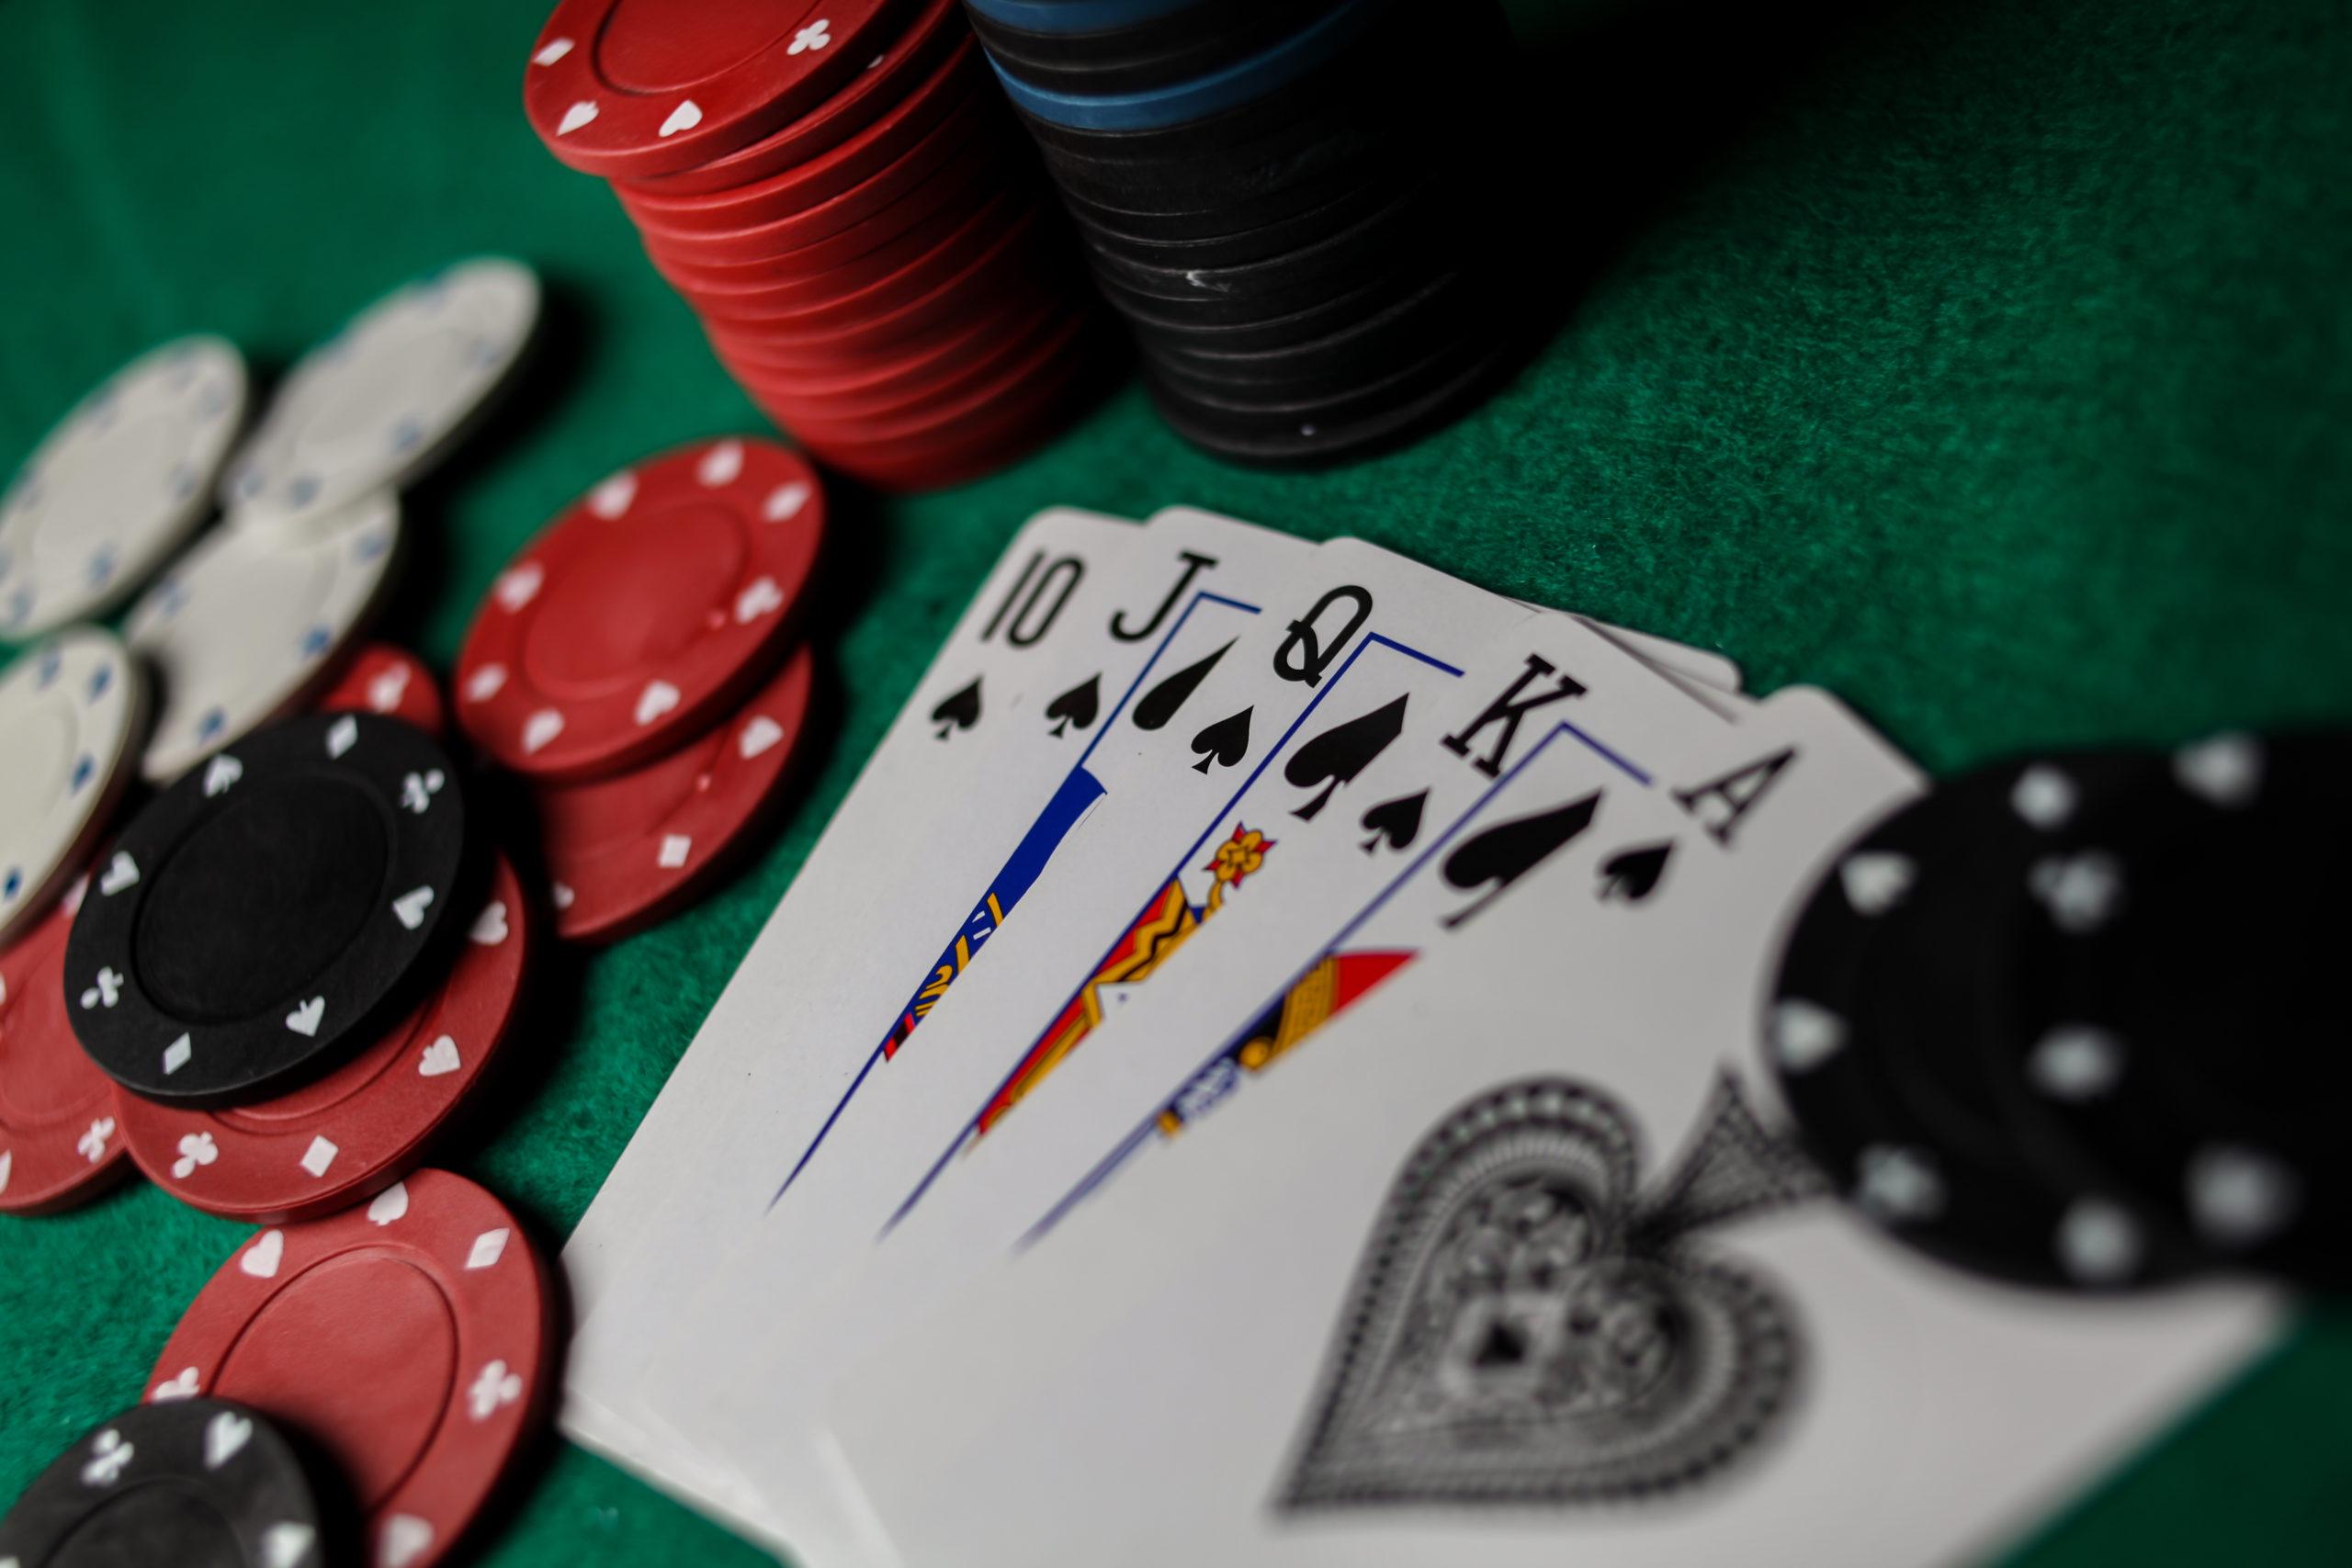 Defensive betting in poker